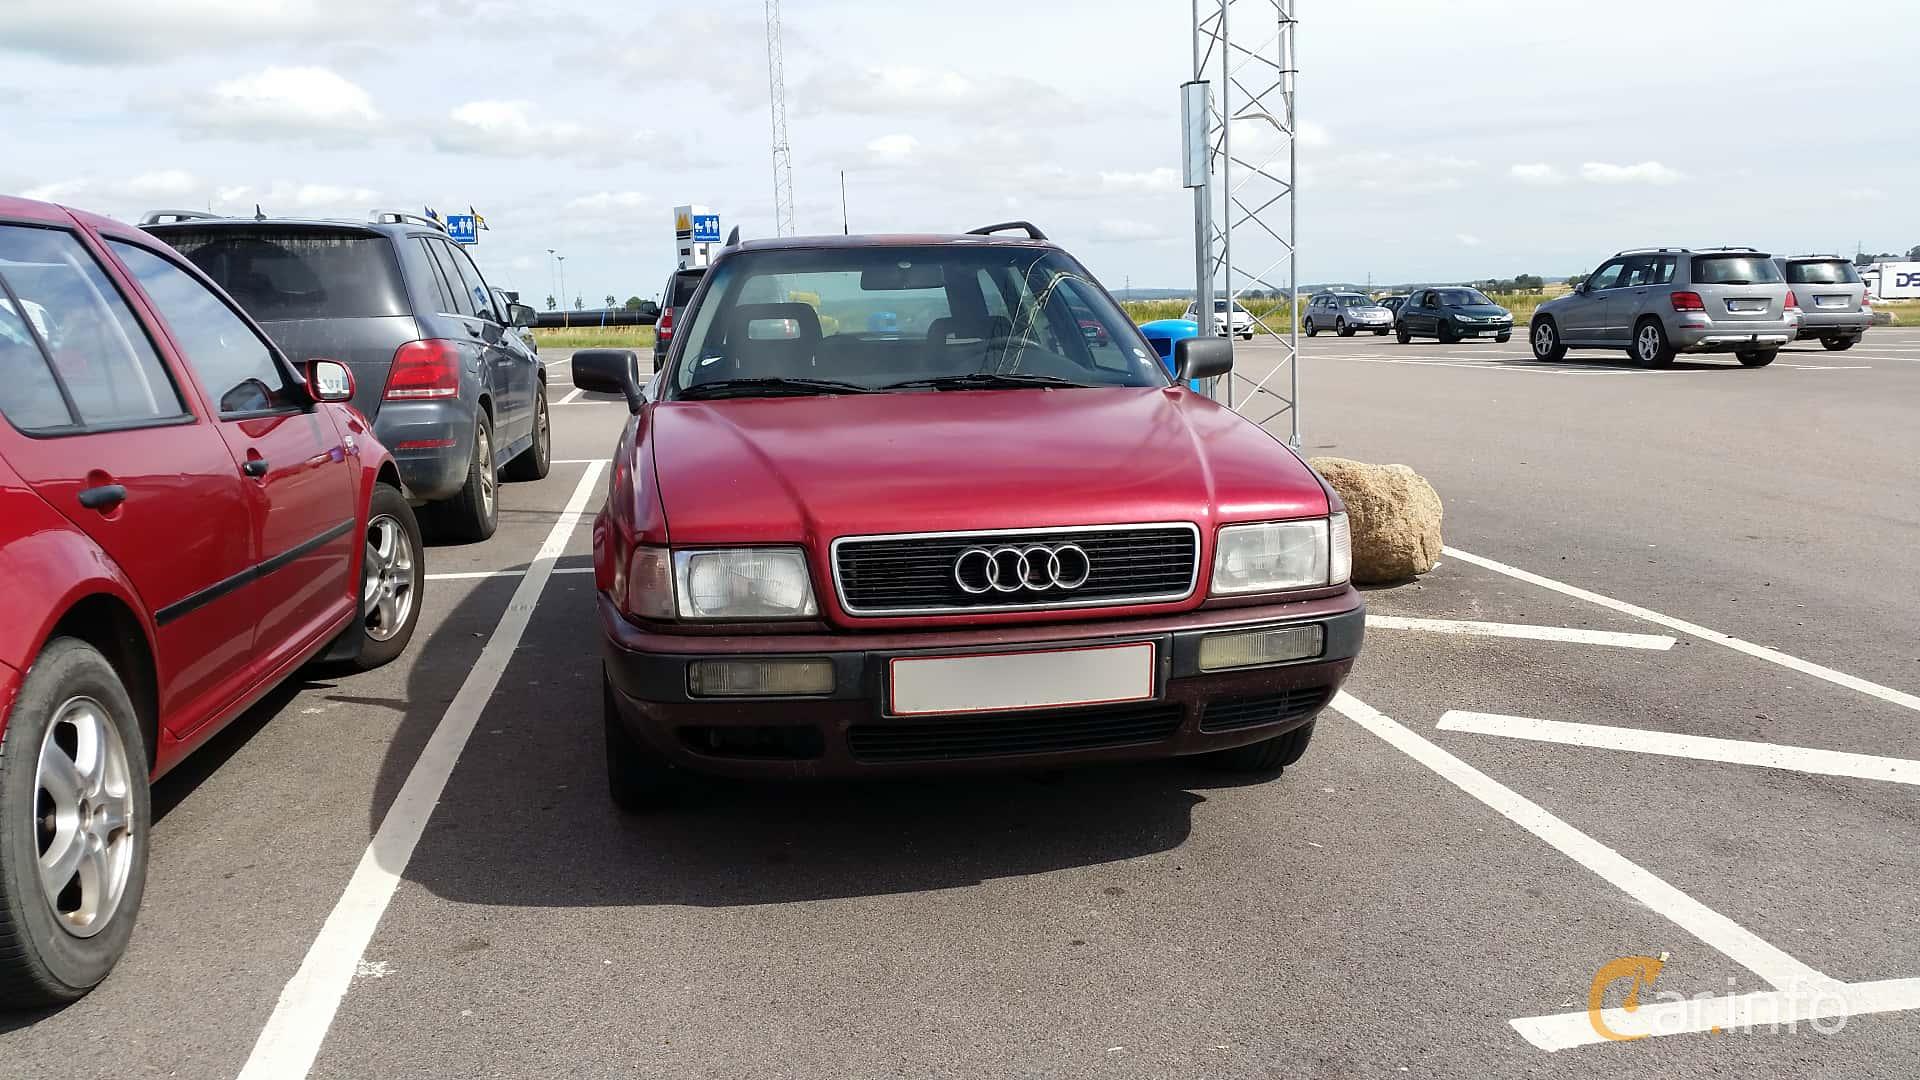 audi 80 avant generation b4 facelift 1 9 tdi manual 5 speed rh car info Audi 80 B4 Ground Effects B7 Audi 80